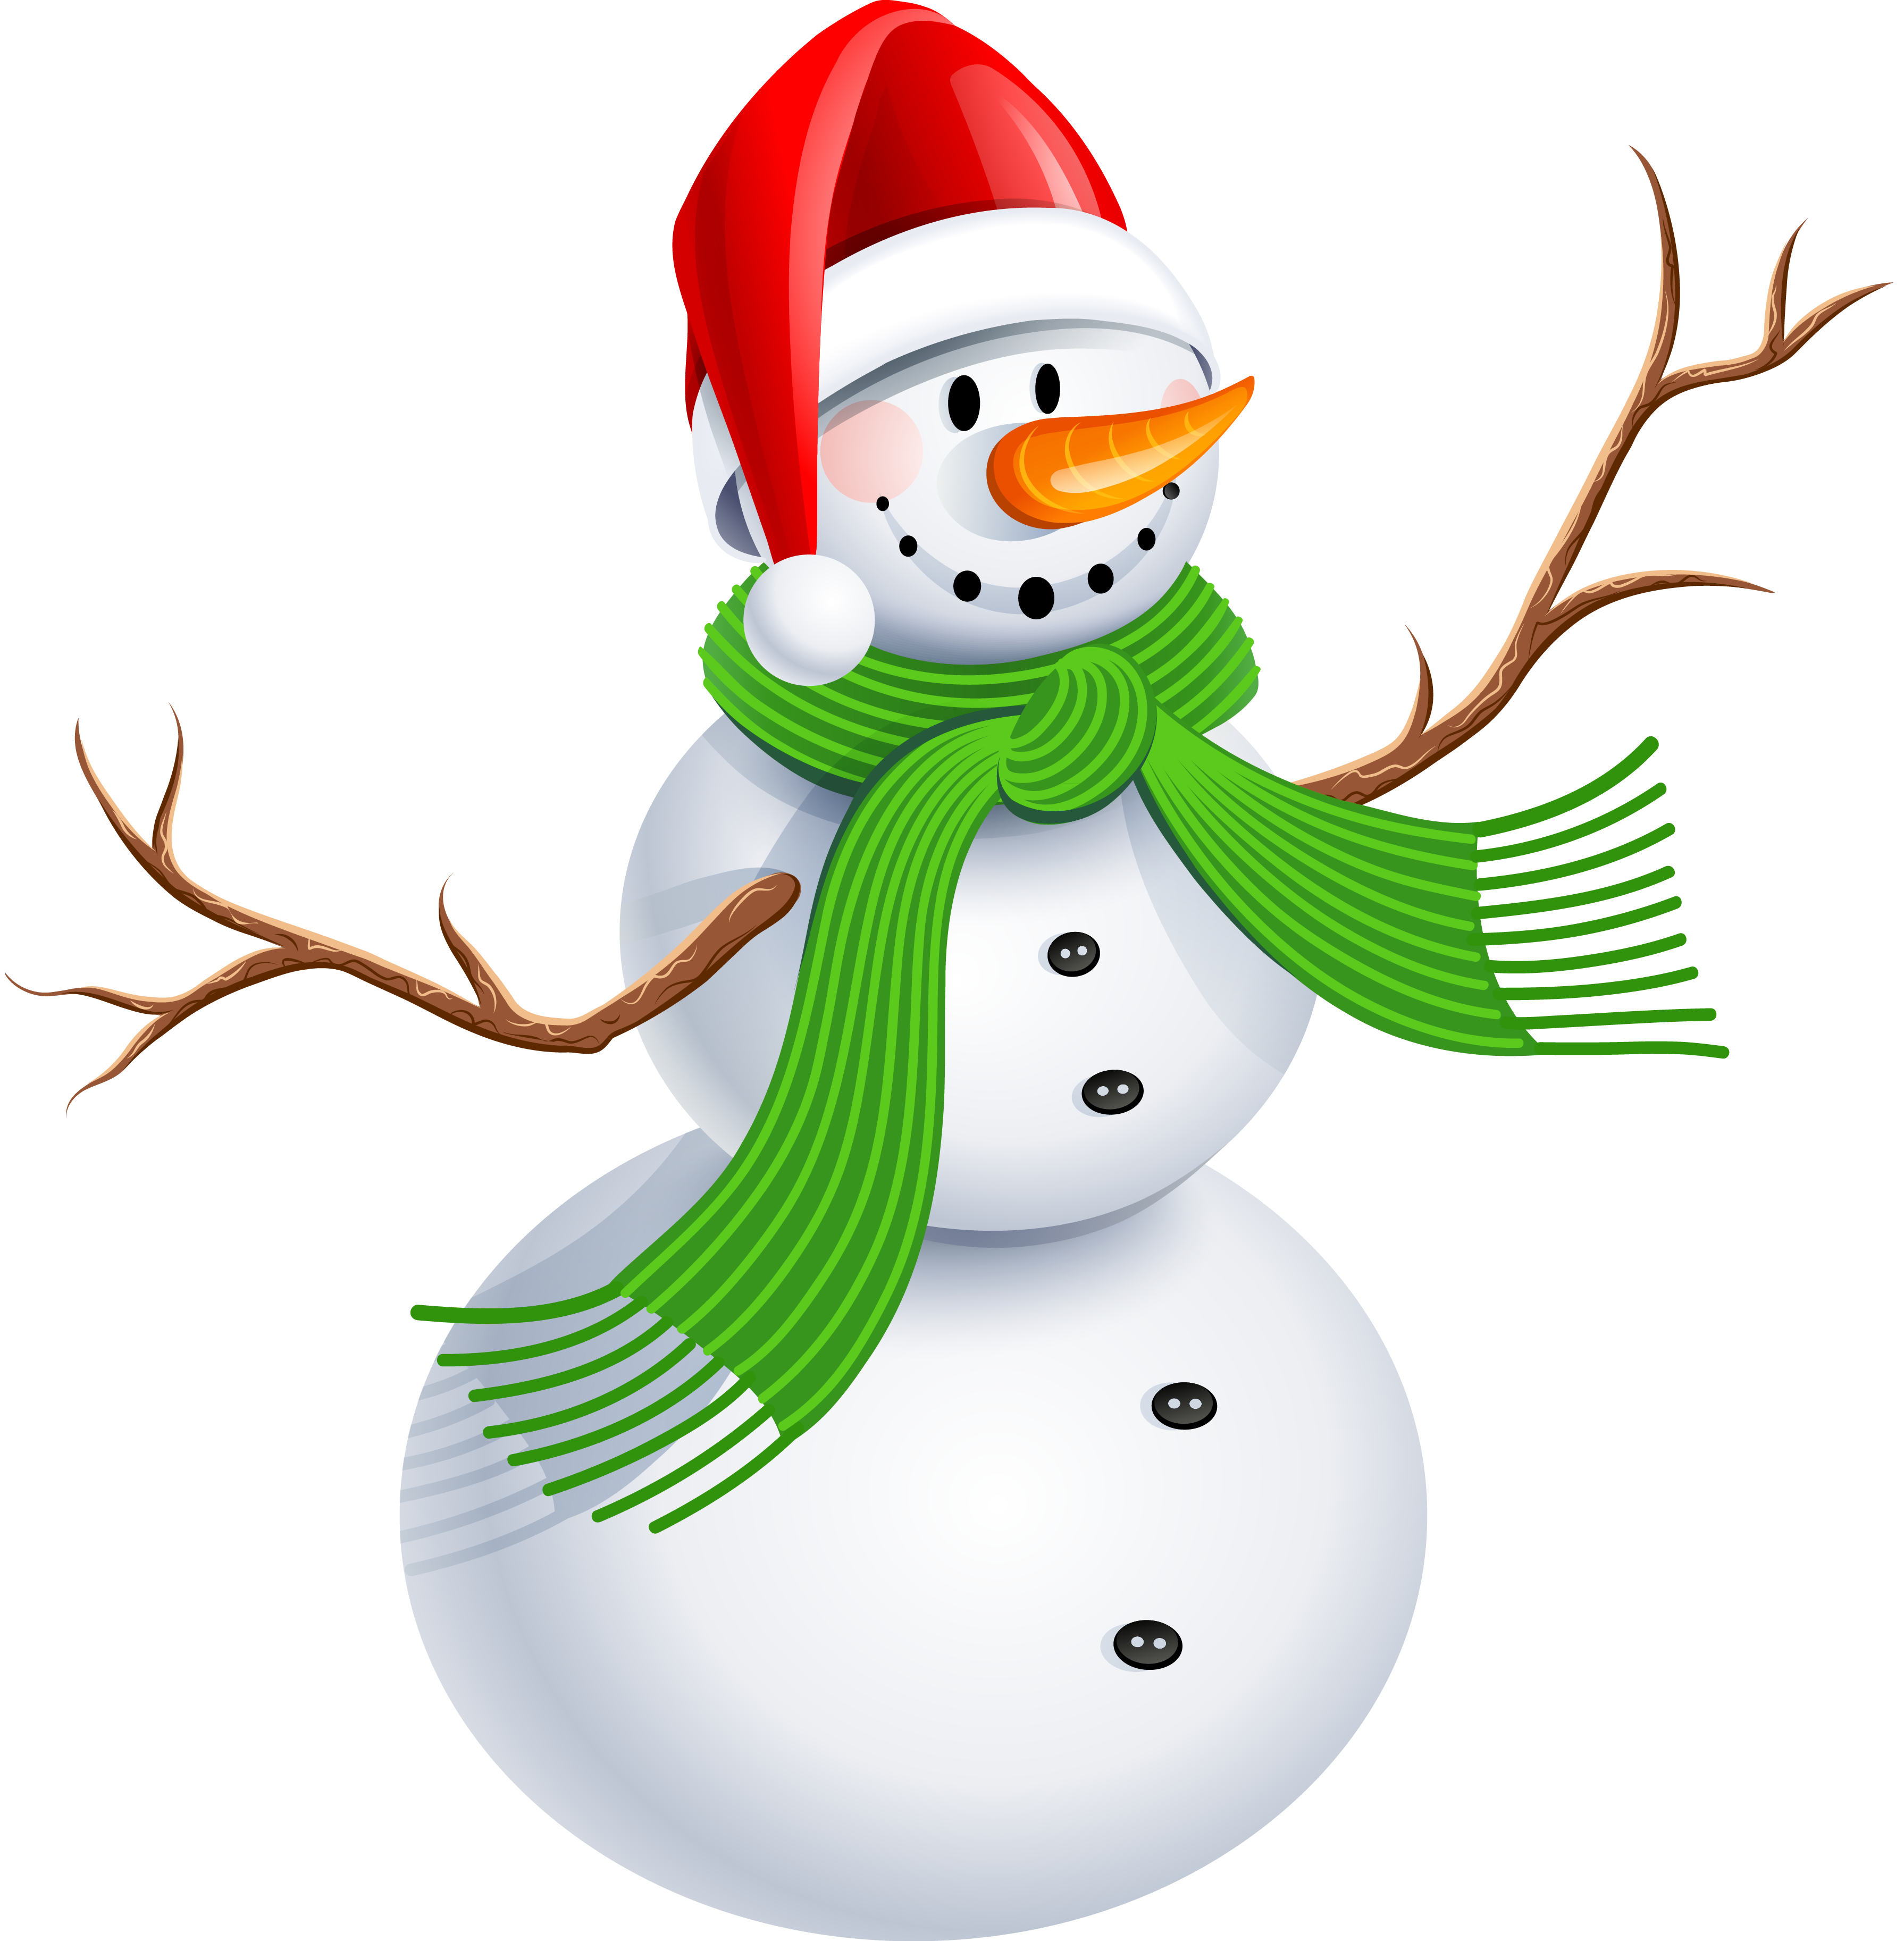 3581x3651 Christmas Snowman Clip Art